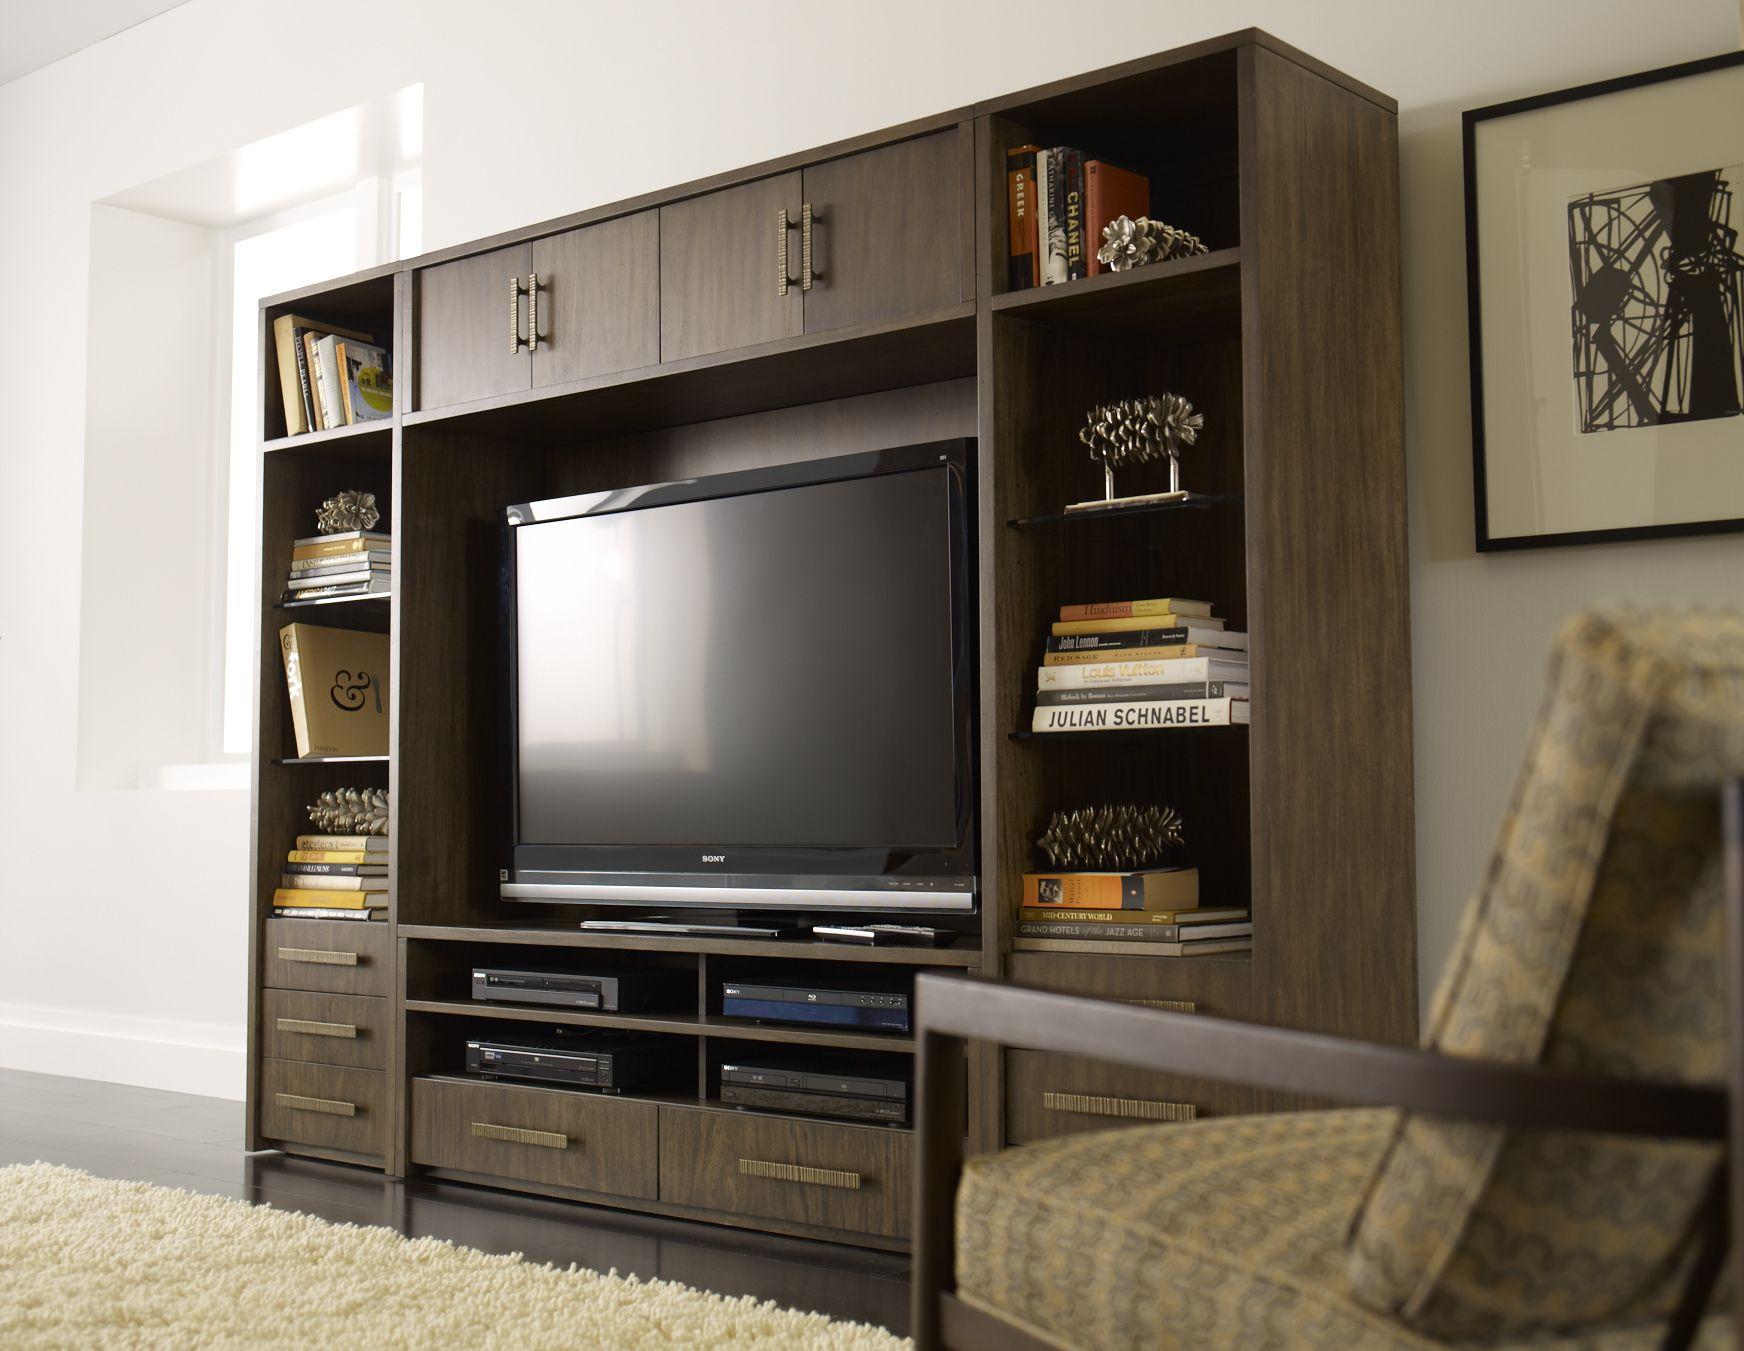 Master bedroom entertainment centers  Benton Media  Ethan Allen Furniture  Pinterest  Room and Living rooms